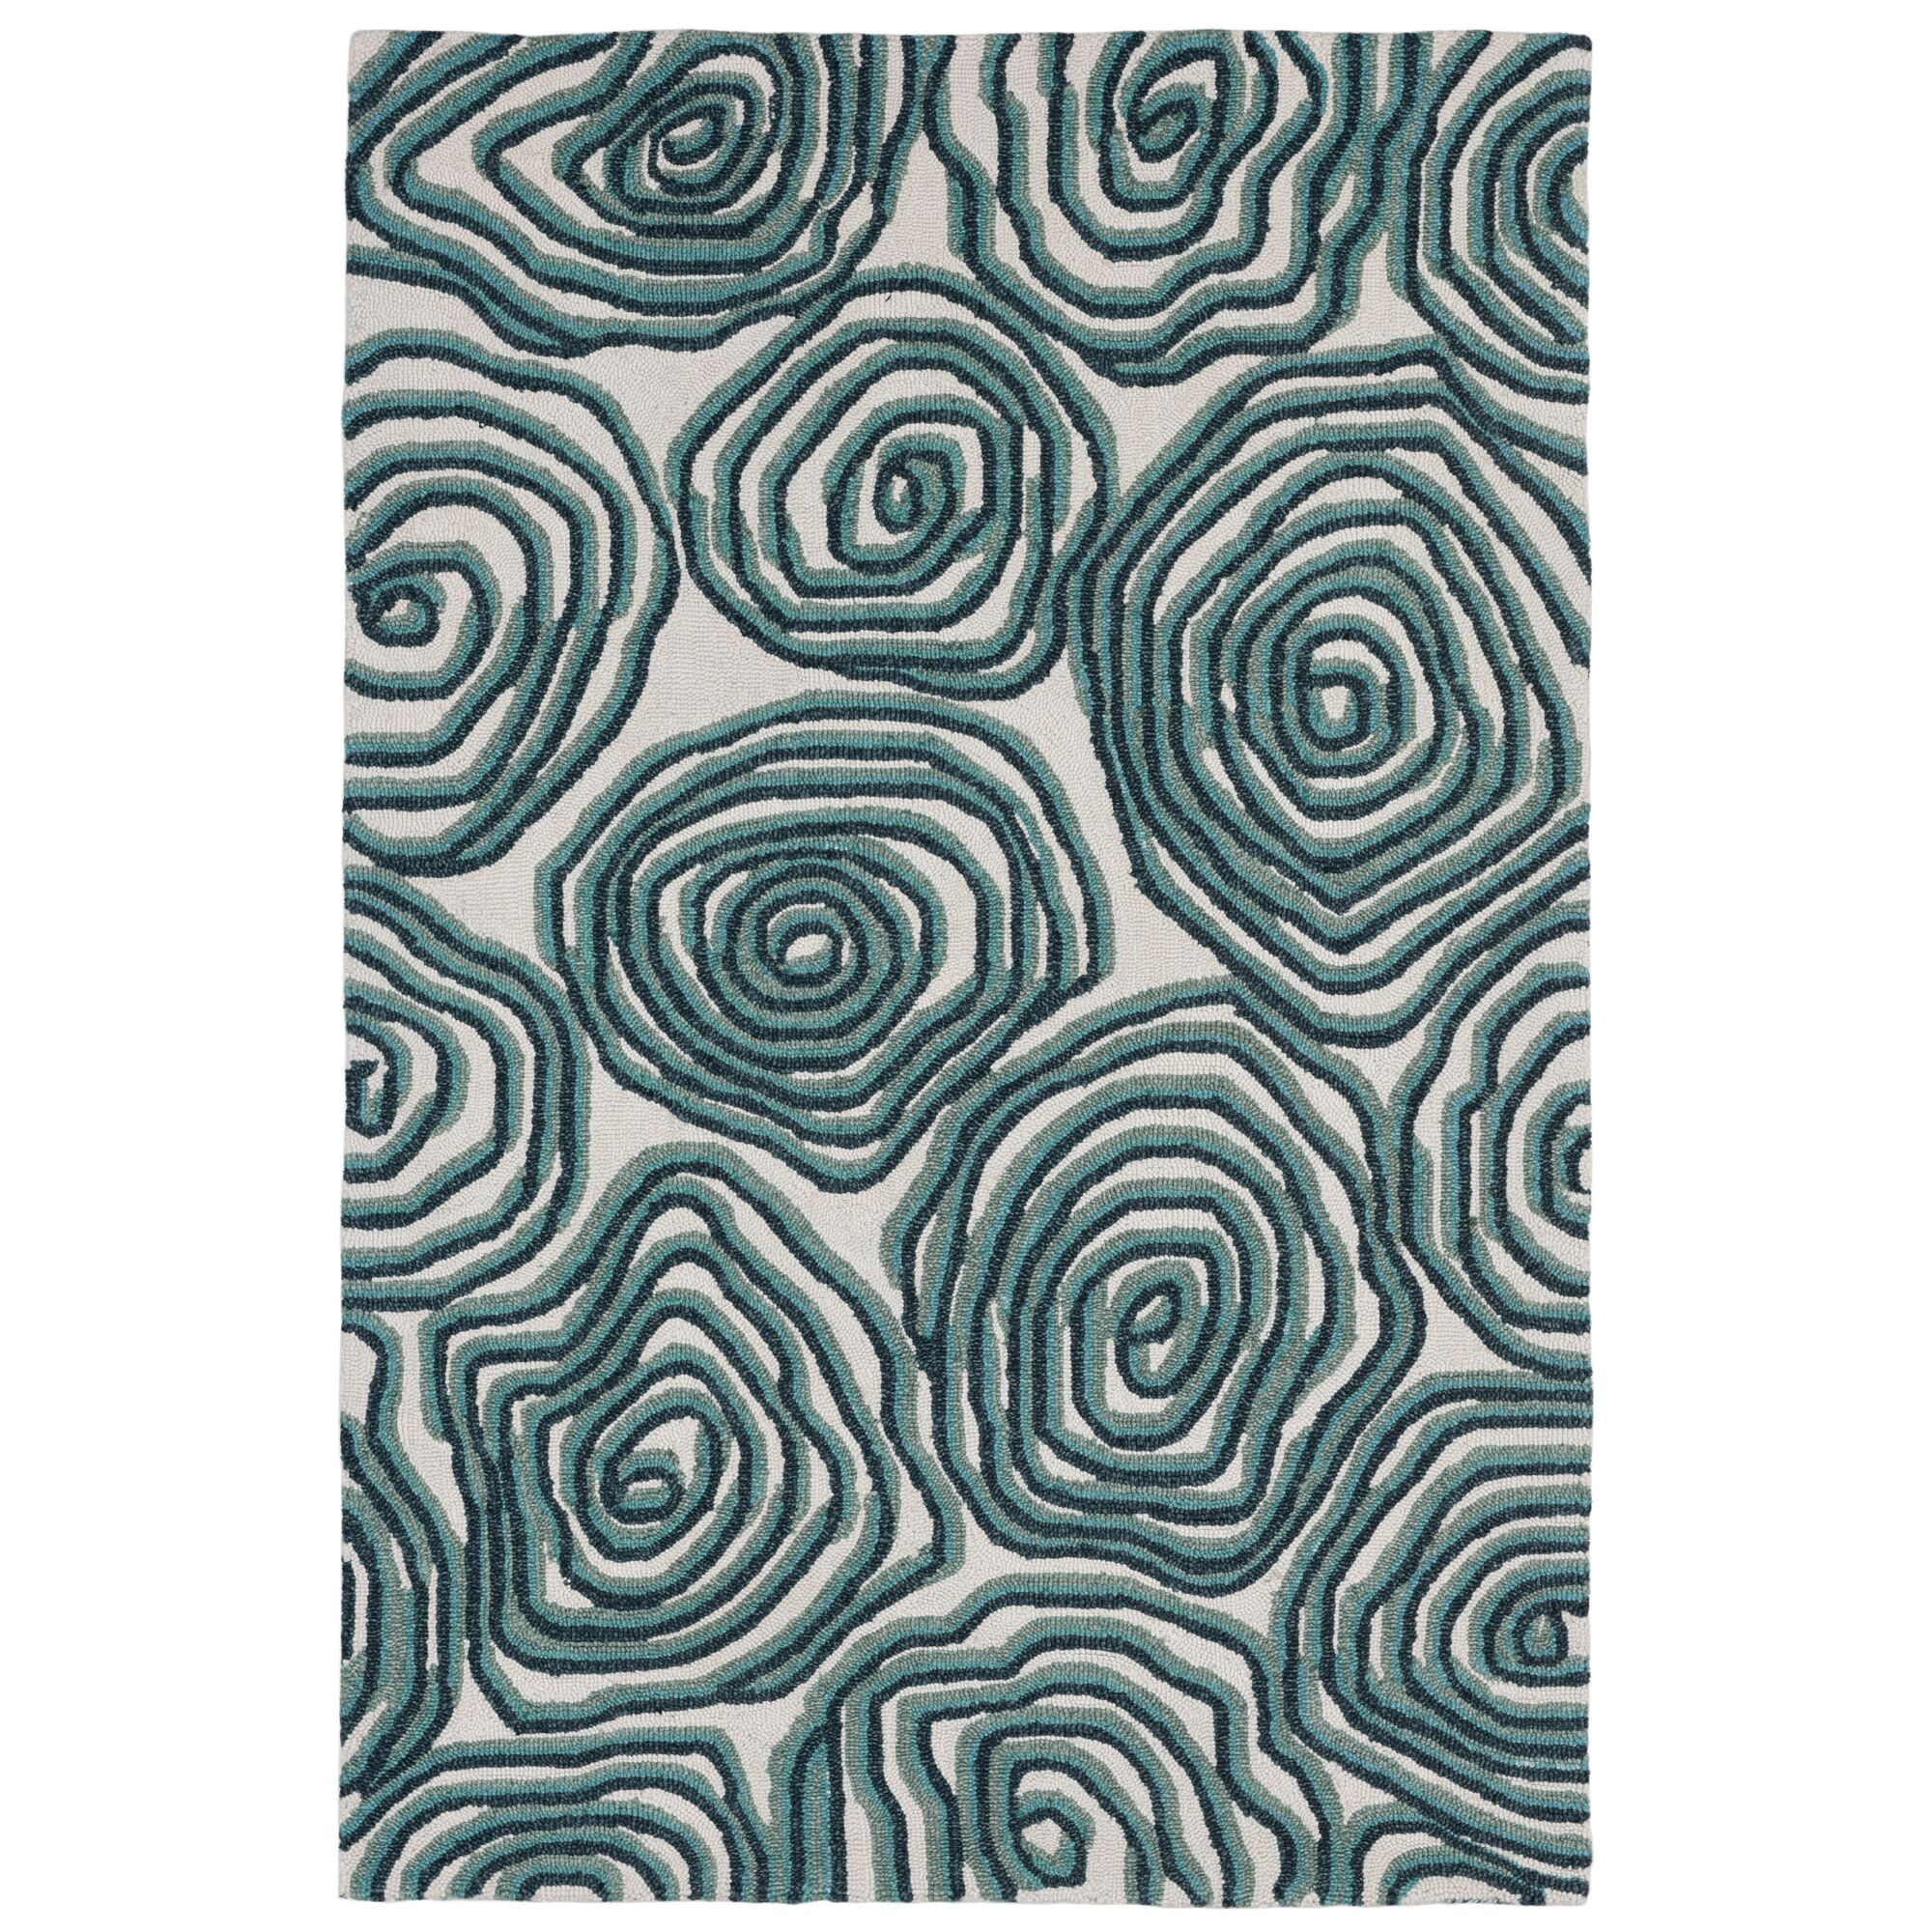 Nancee Block Print Hand-Tufted Green/Beige Area Rug Rug Size: Rectangle5' x 7'6